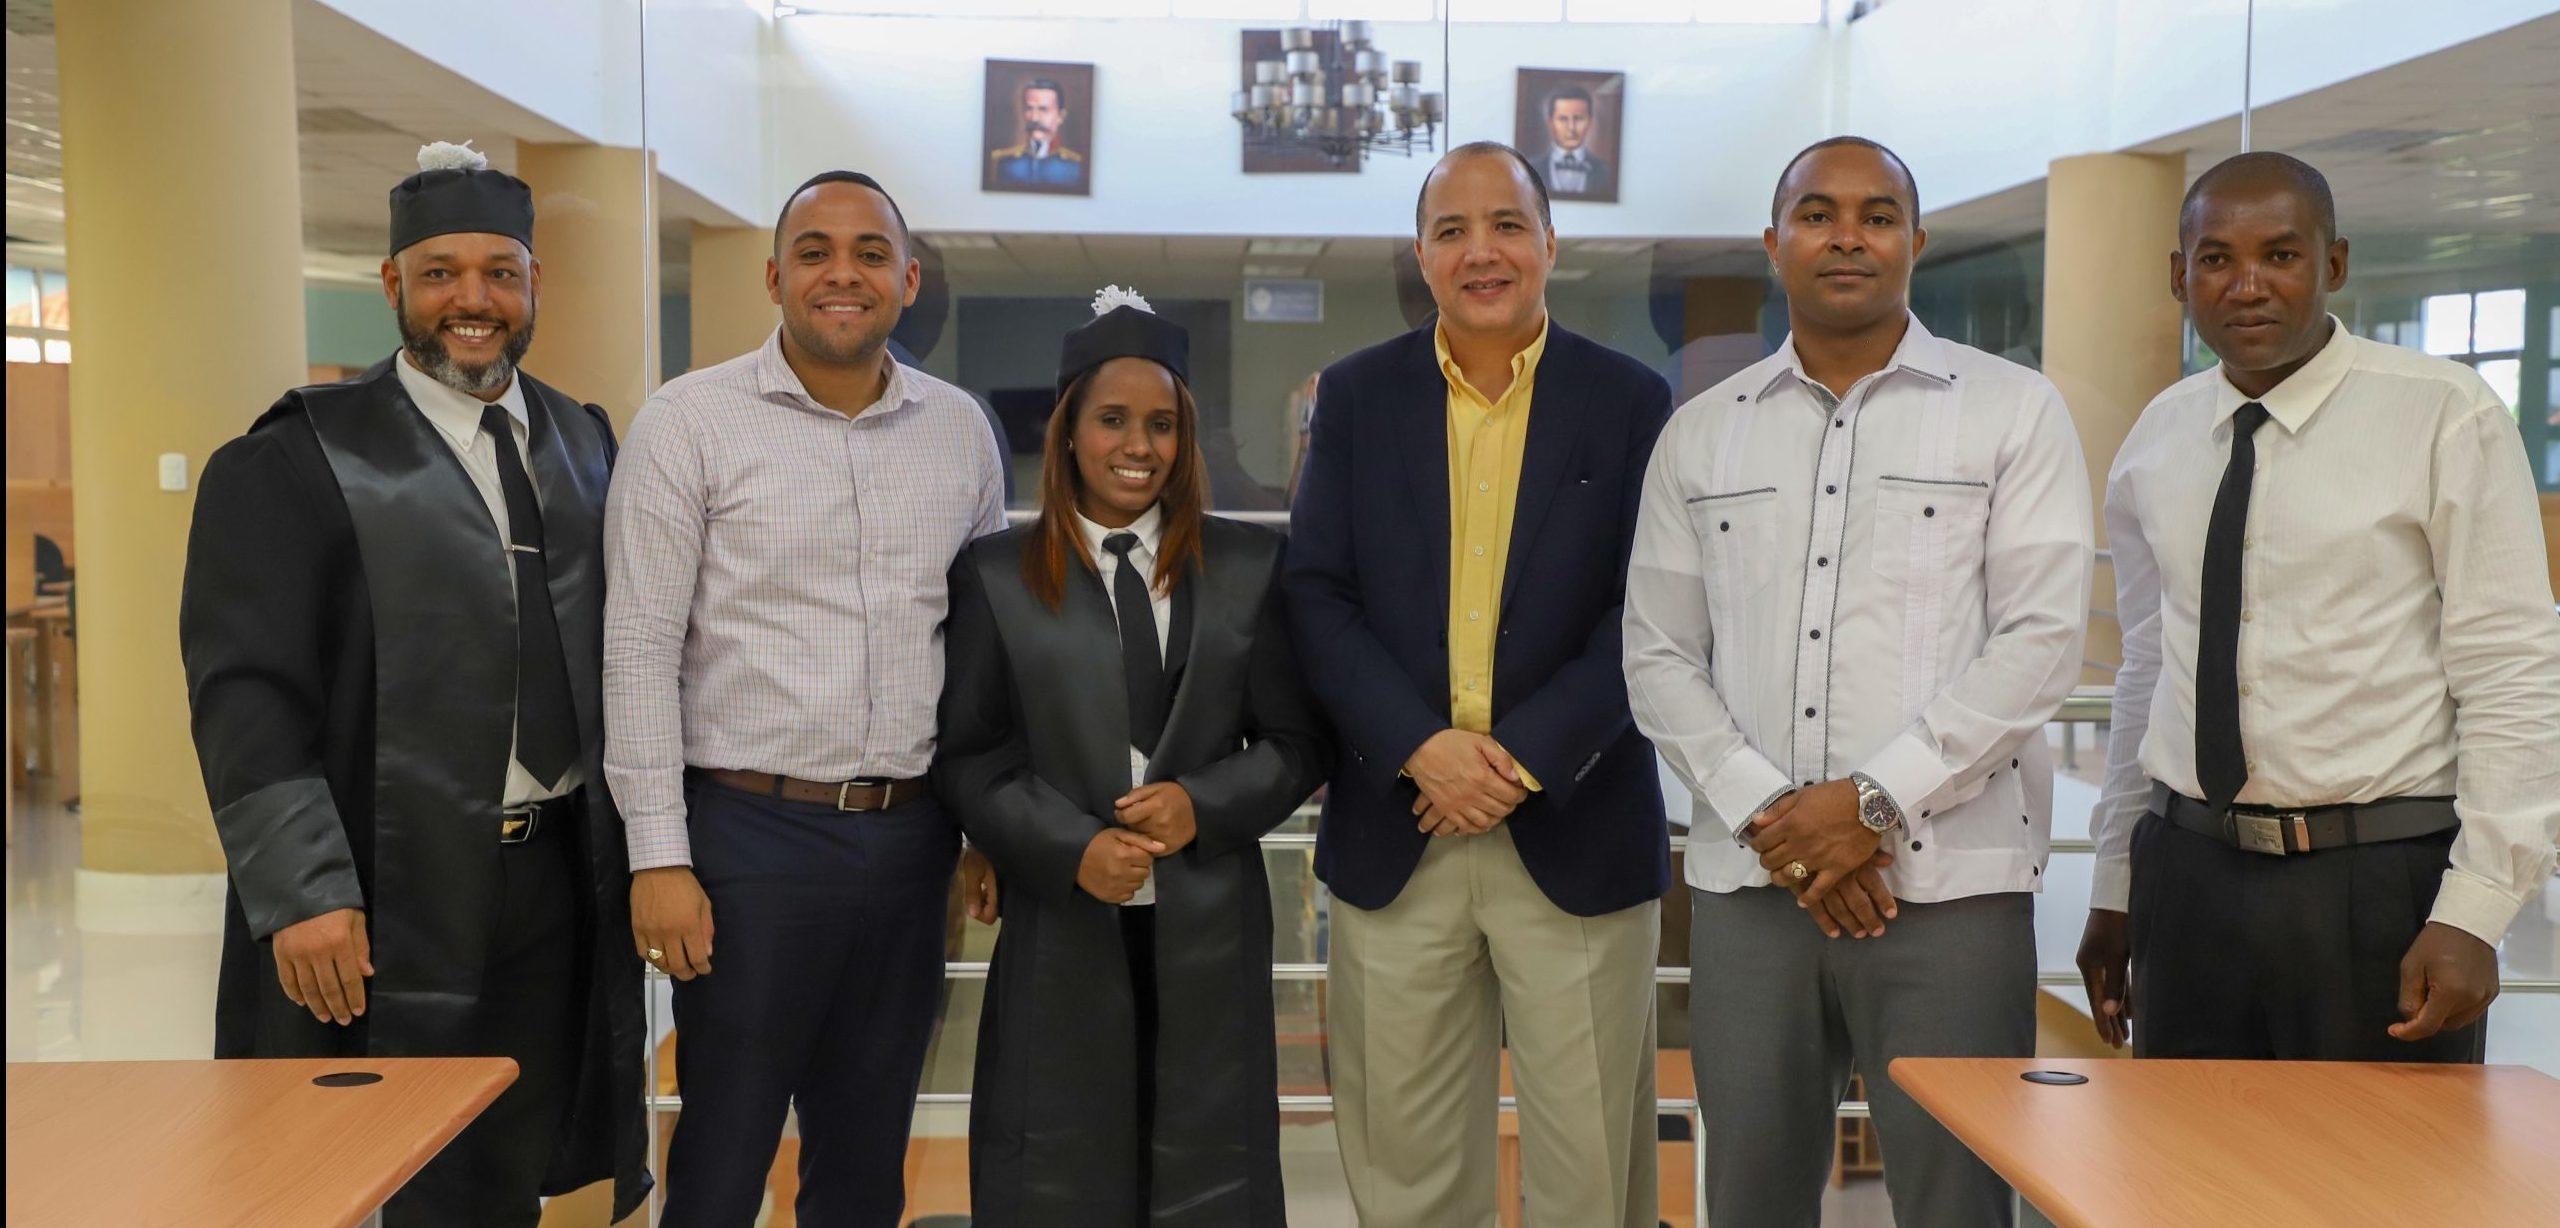 UASD San Juan recibe donativo de togas e investigaciones piloto de criminalidad en sectores locales